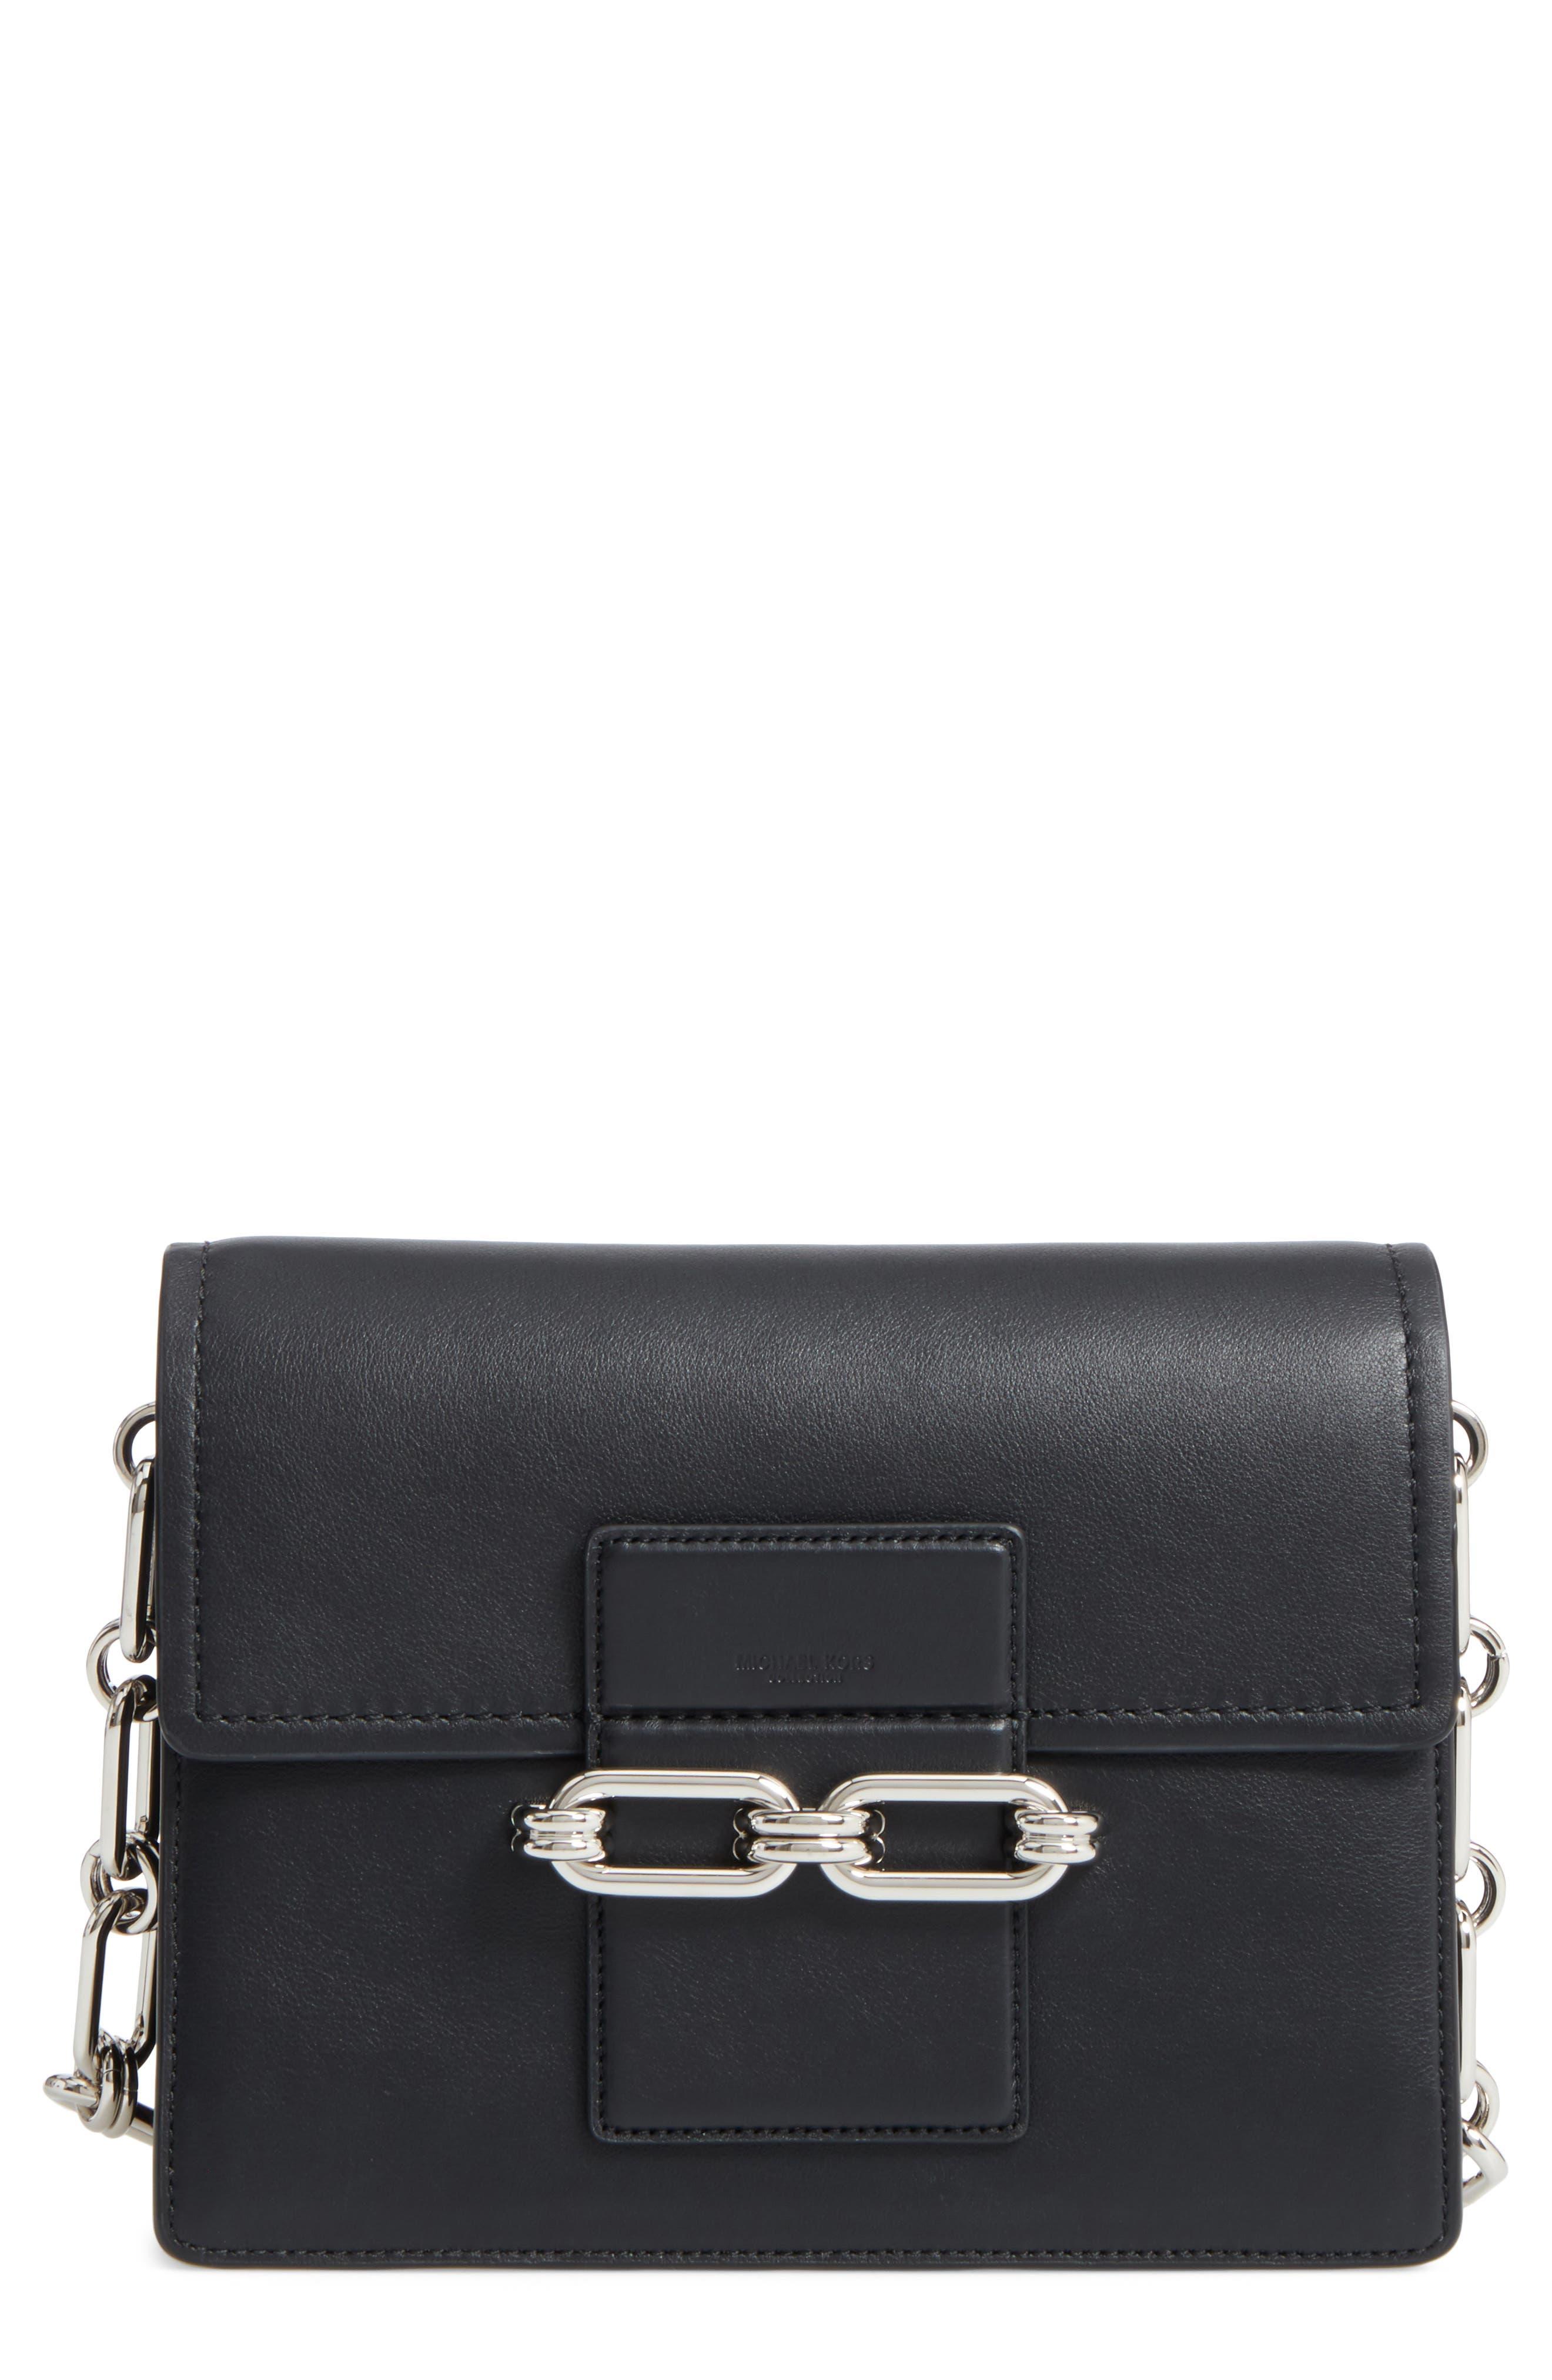 Medium Shoulder Bag,                             Main thumbnail 1, color,                             Black